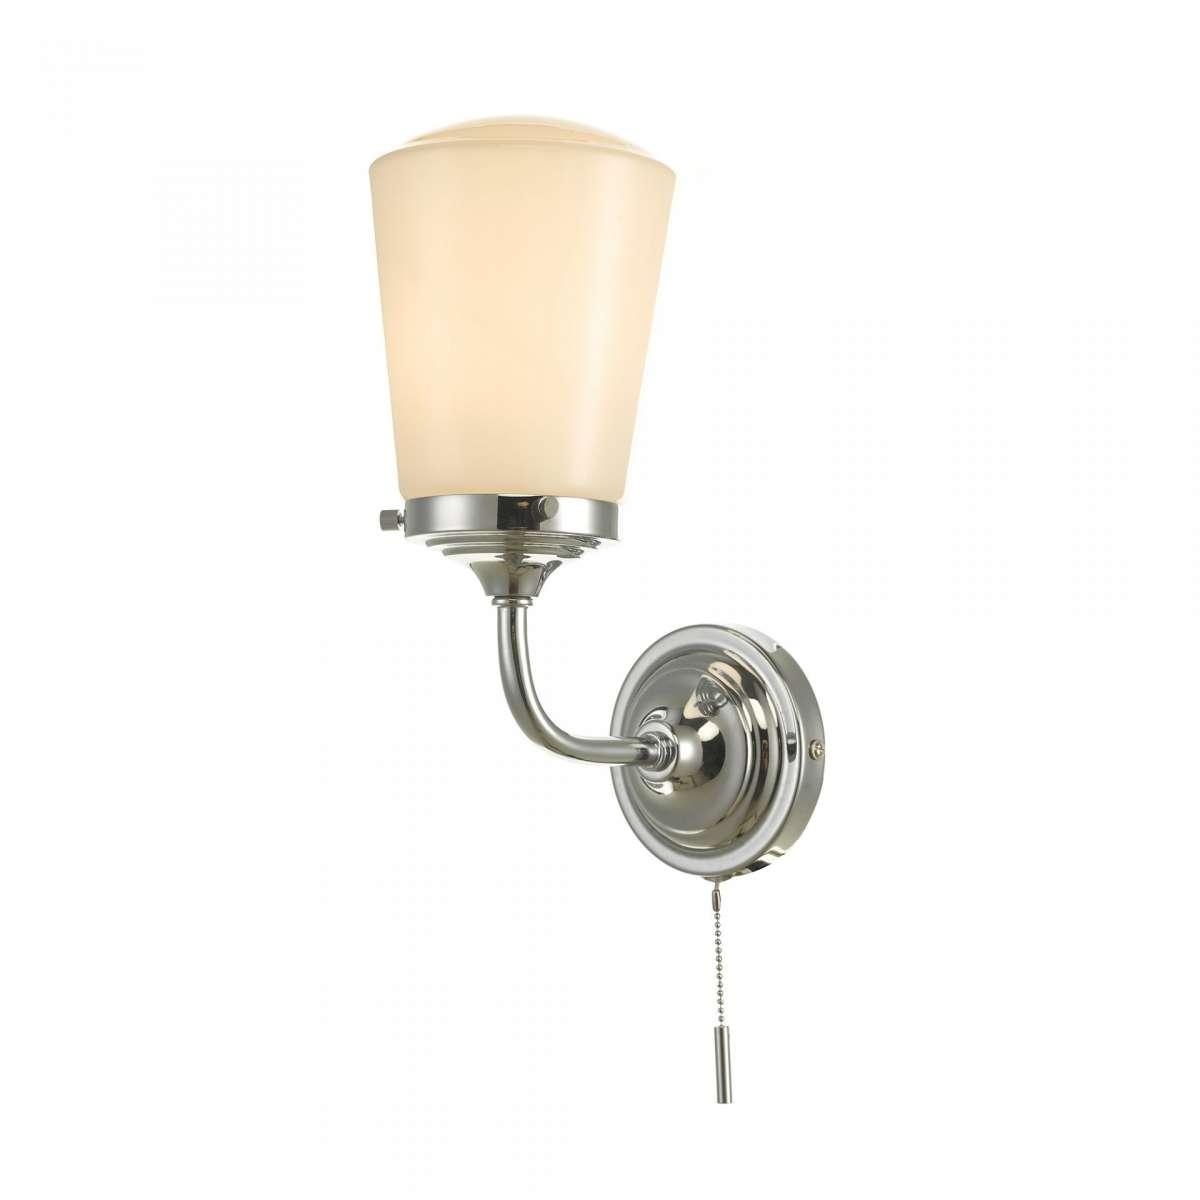 där lighting CAD0750 Caden Bathroom Wall Light Polished Chrome